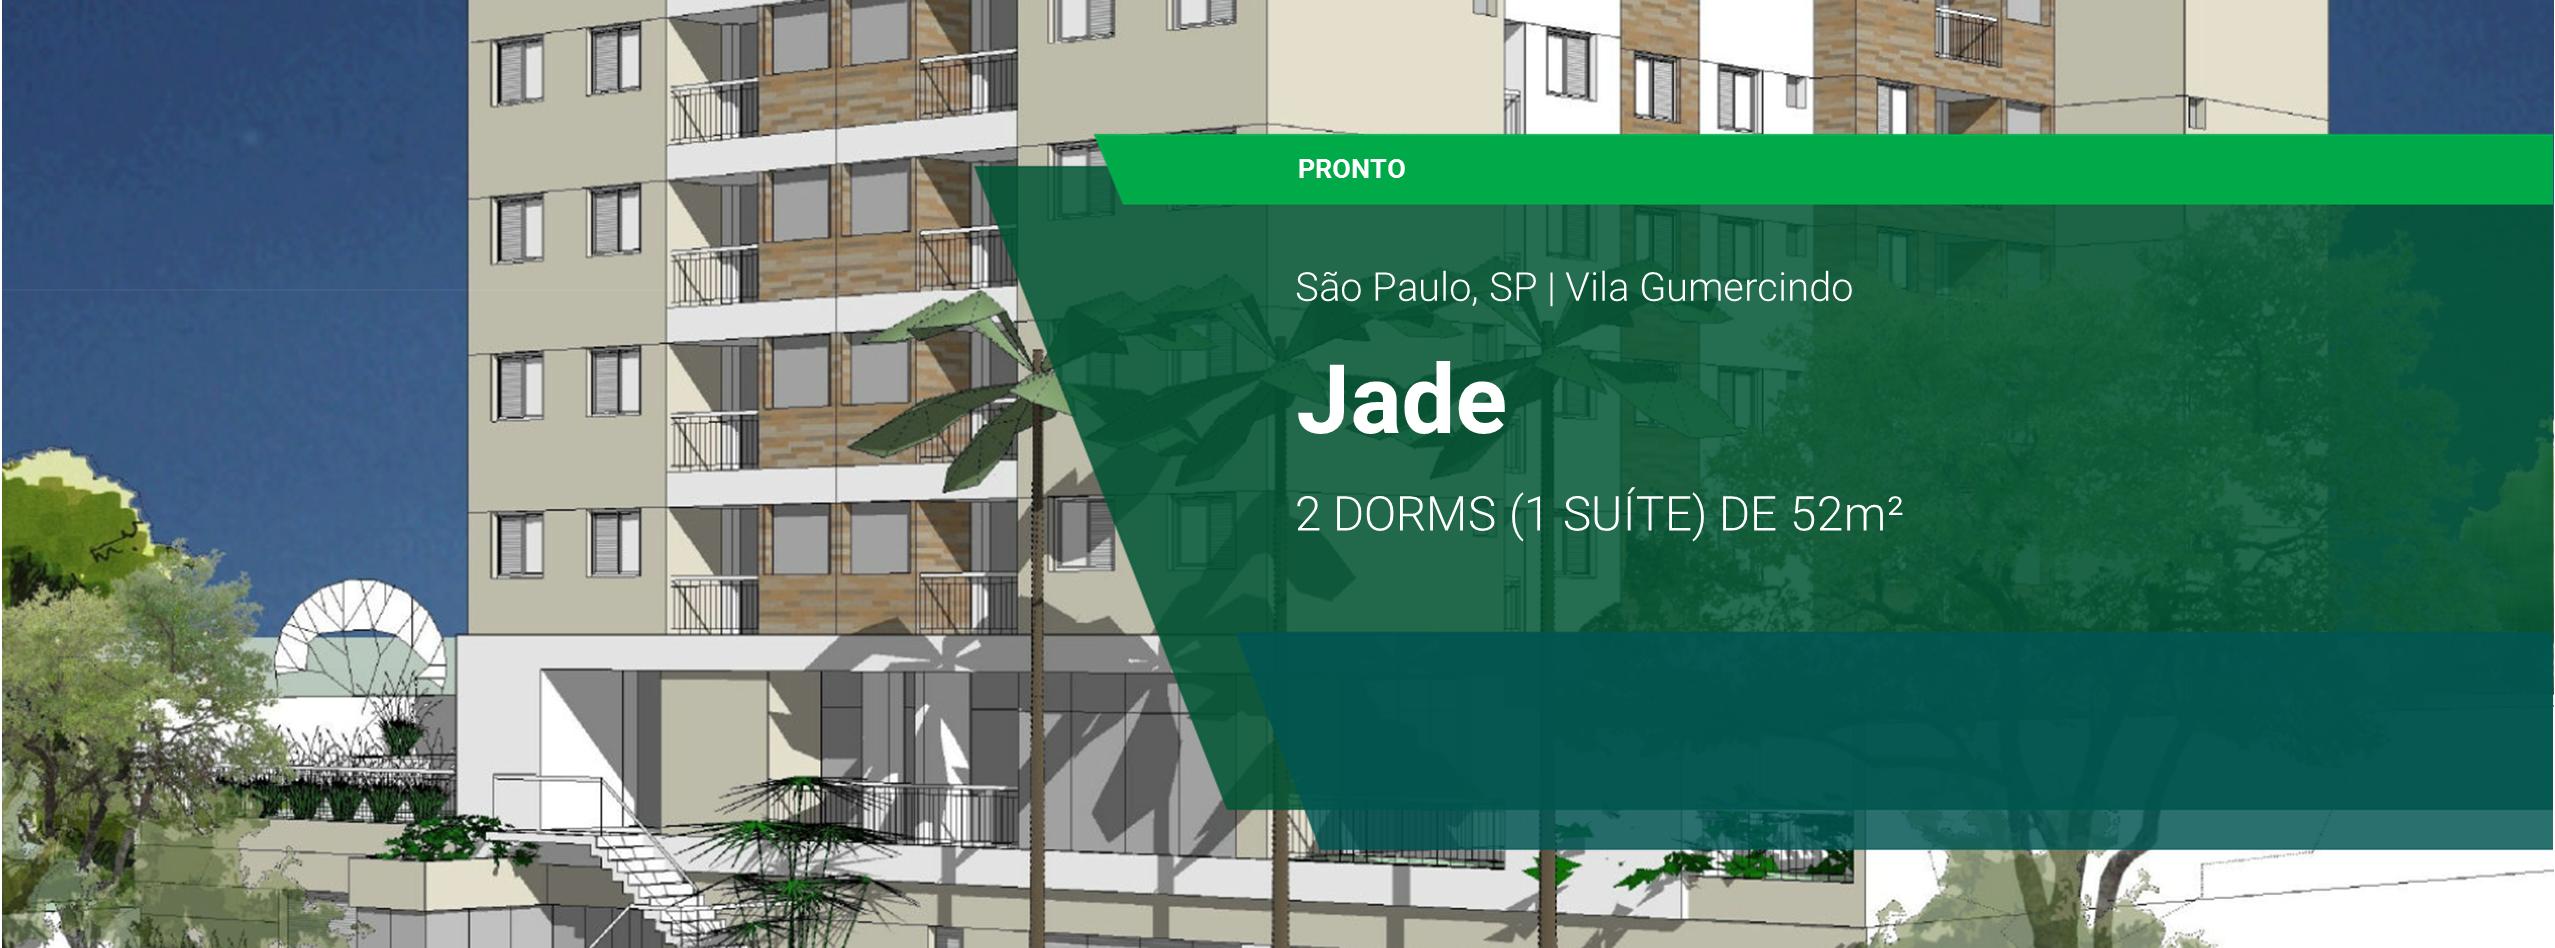 edificio-jade-matushita